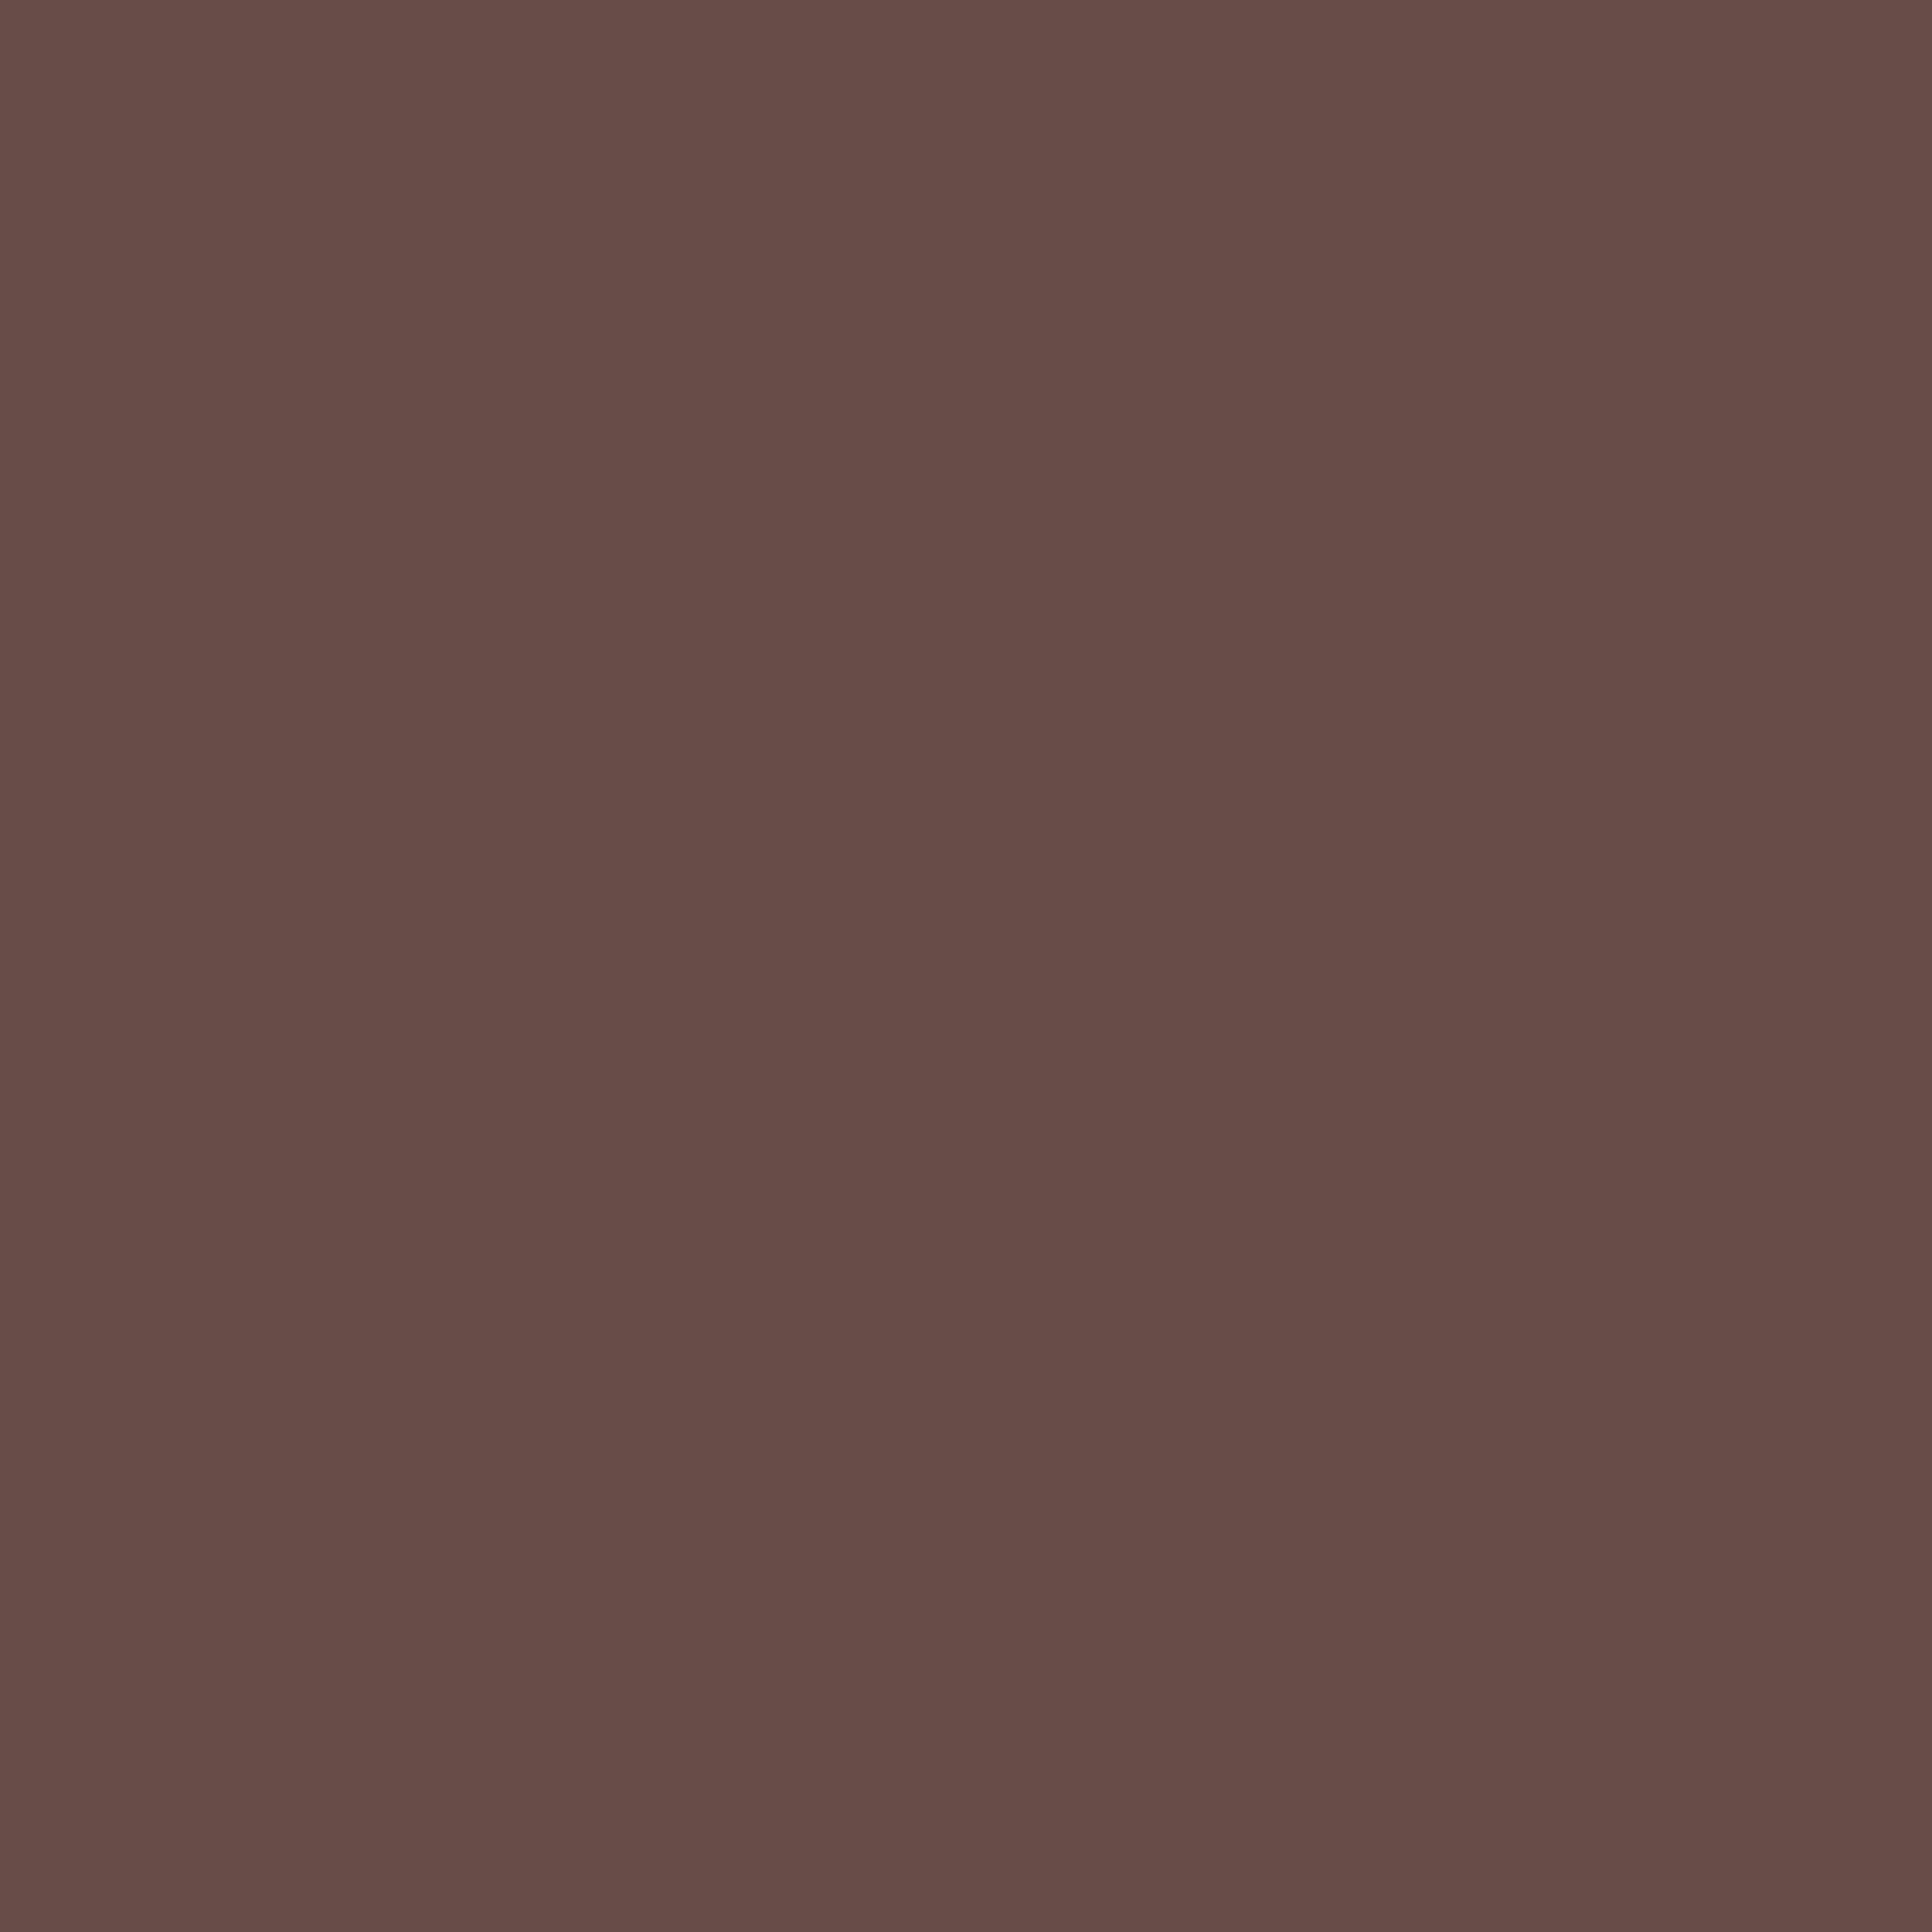 3600x3600 Liver Solid Color Background